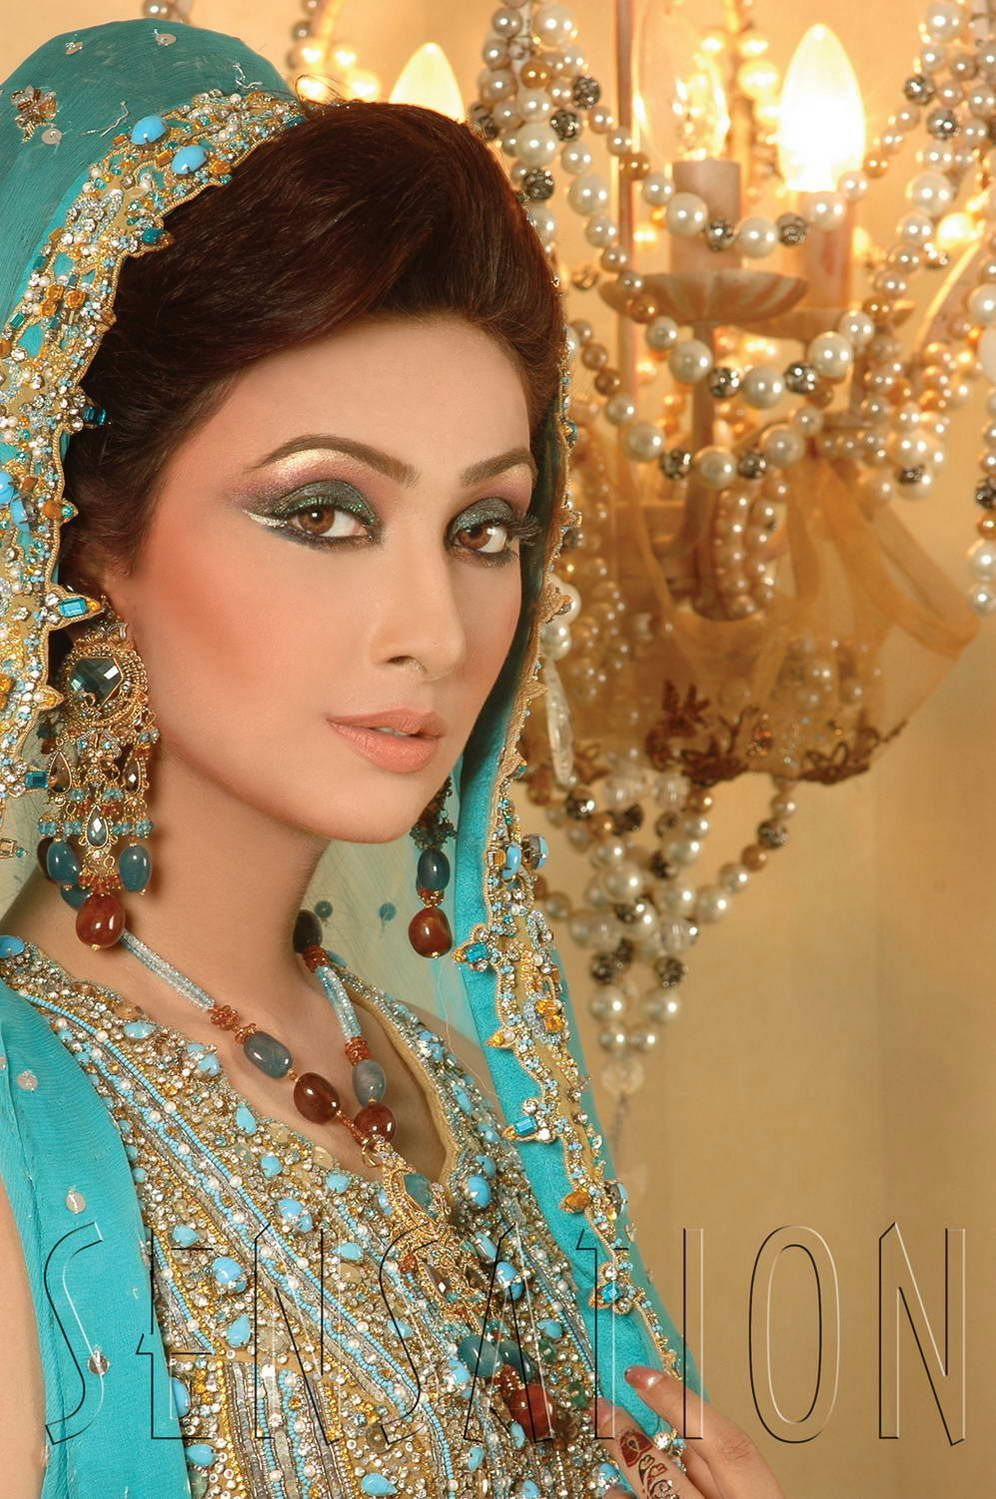 Ayyan ali bridal jeweller photo shoot design 2013 for women - Pakistani Bridal